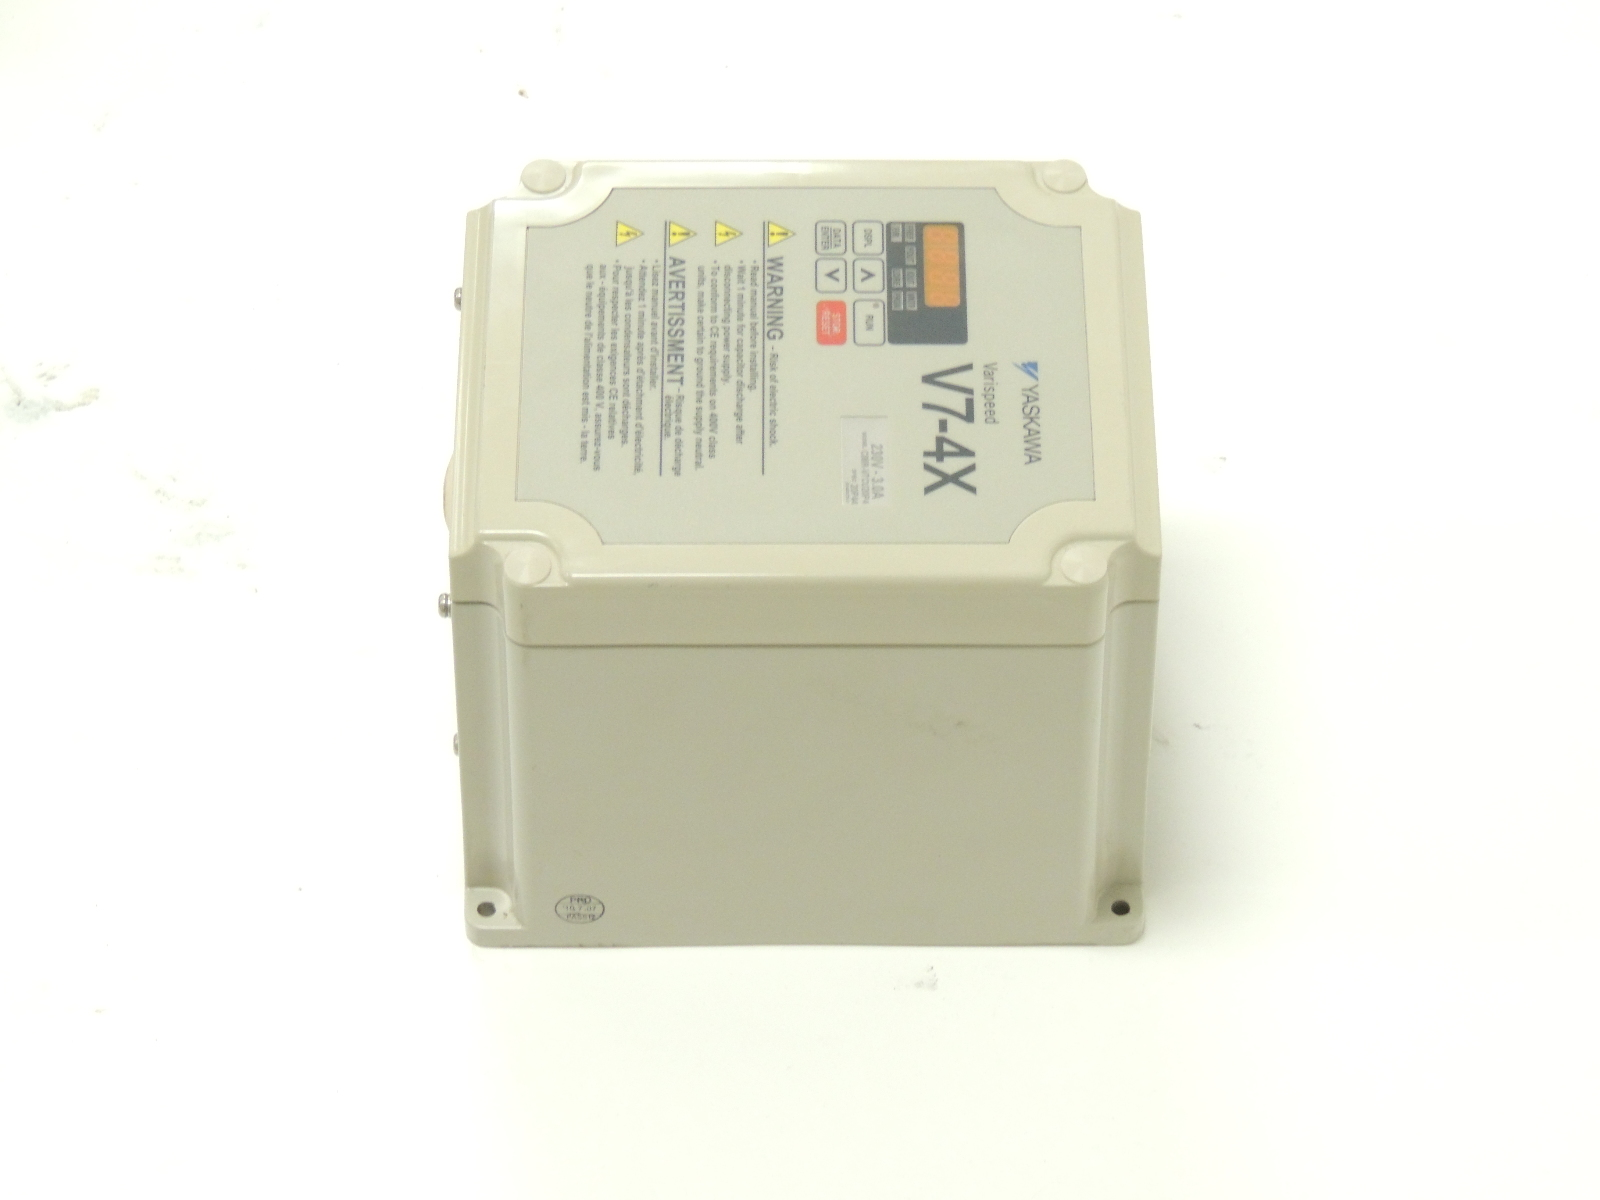 Yaskawa Drives E7 Ac Drive Cimr E7u45p5 No Controller Vfd Wiring Diagrams Download